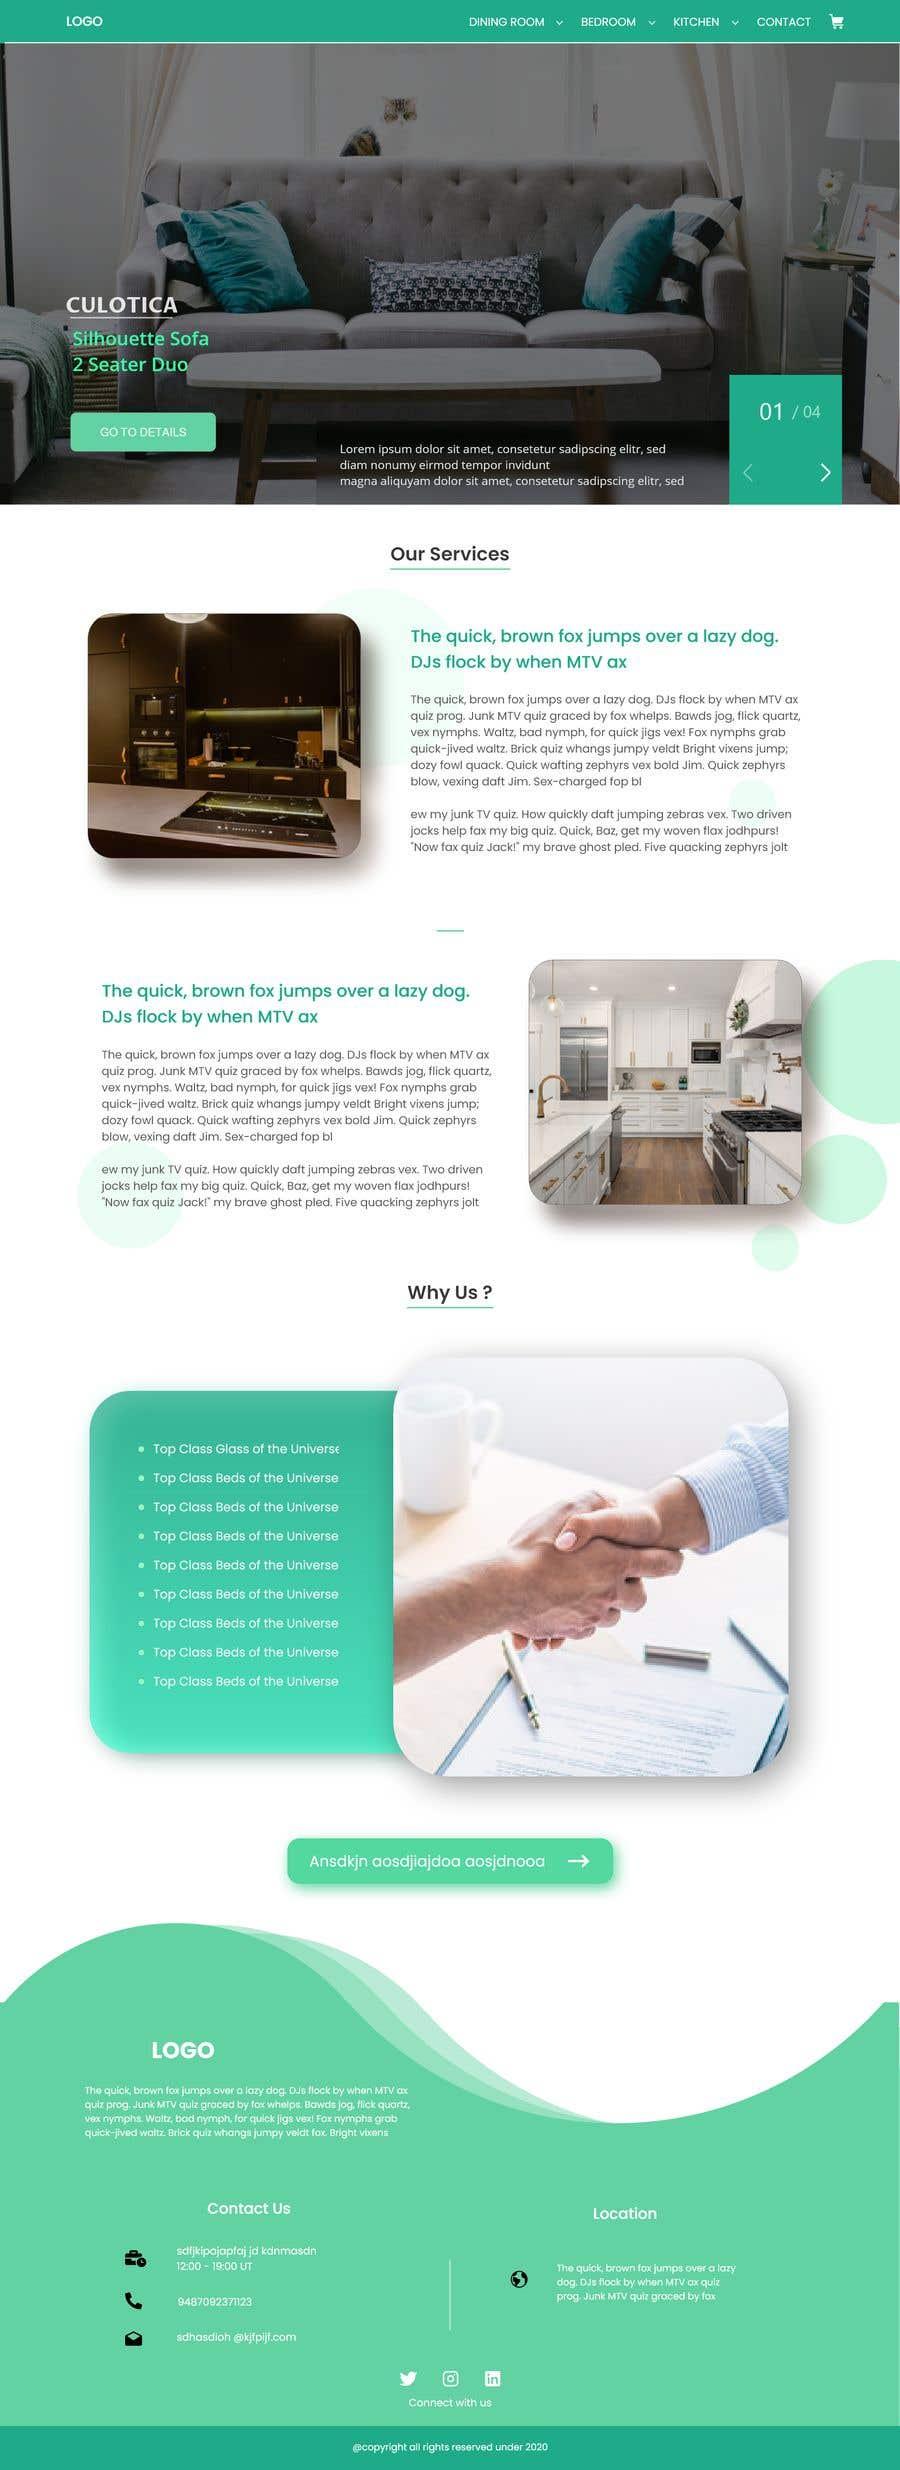 Proposition n°                                        8                                      du concours                                         Re-design website for easier UX and UI